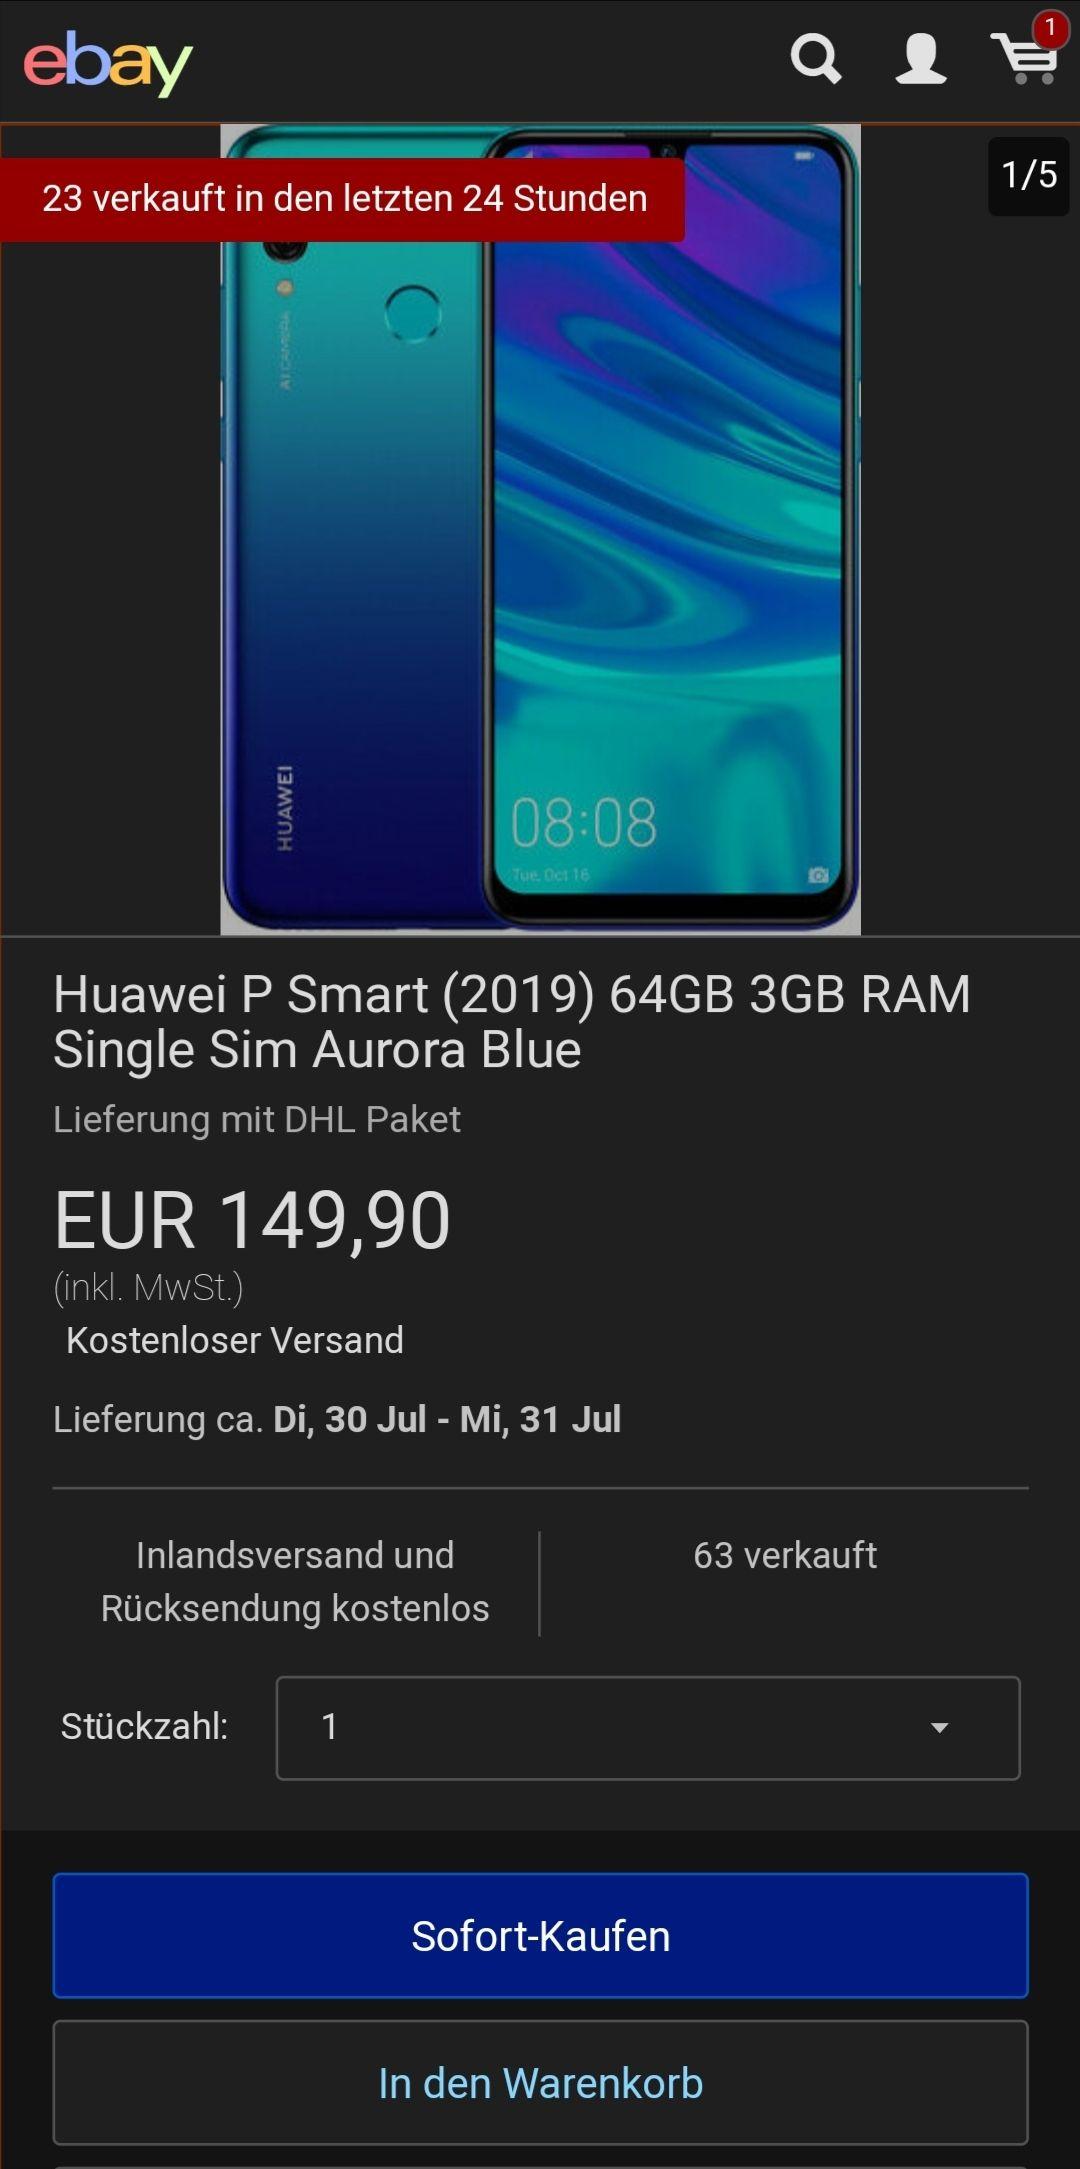 Huawei P Smart (2019) 64GB 3GB RAM Single Sim Aurora Blue 149€ NEUWARE